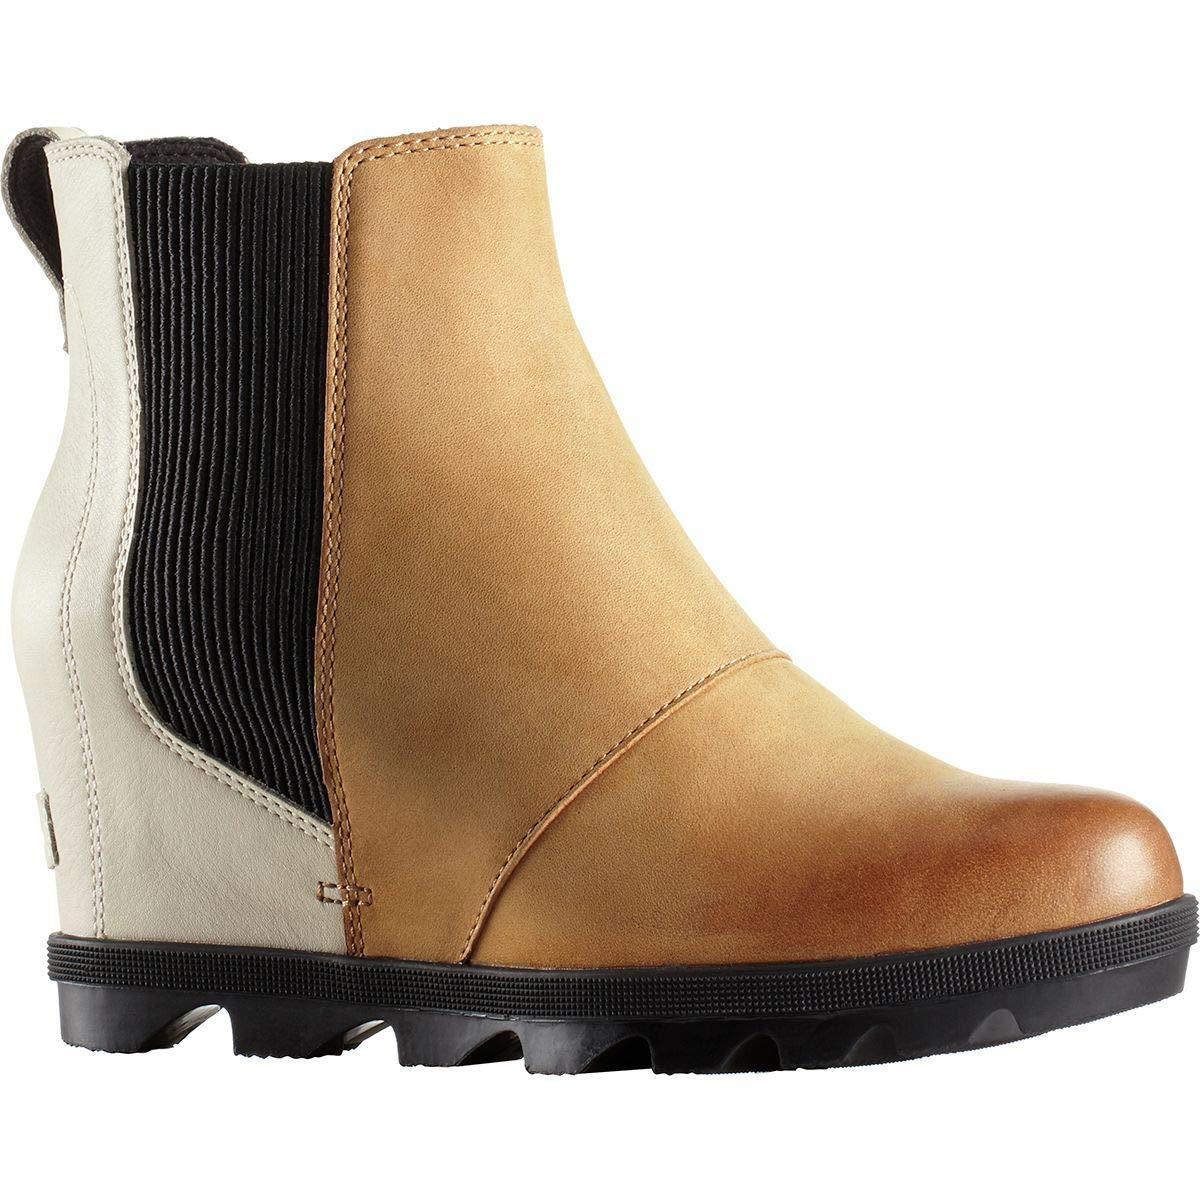 Camel Brown Joan of Arctic™ Wedge II Chelsea - Footwear  Women's Footwear  Women's Lifestyle